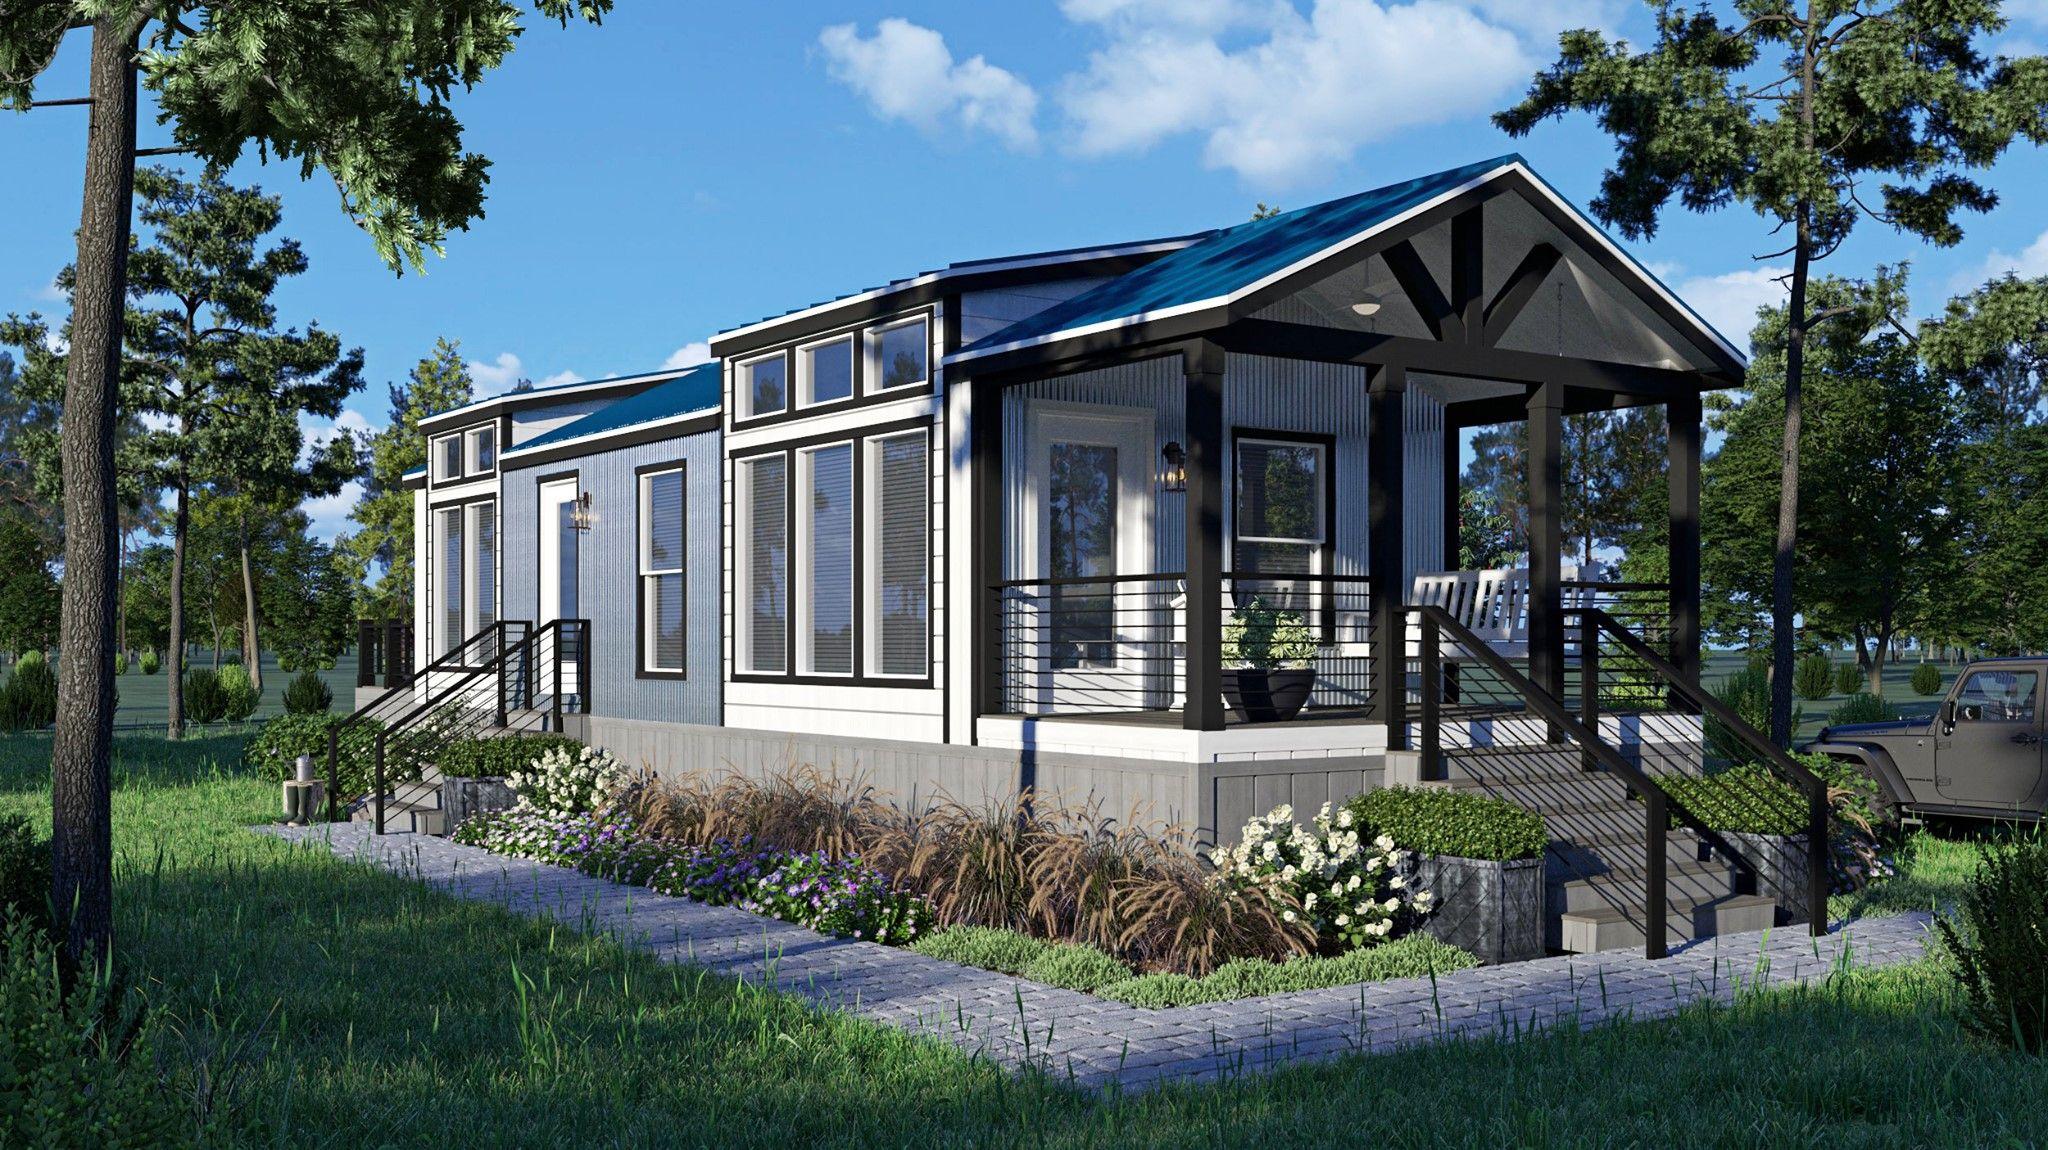 Live Smarter With A Smart Cottage Home Oak Creek Homes Cottage Homes Oak Creek Homes Modern Tiny House